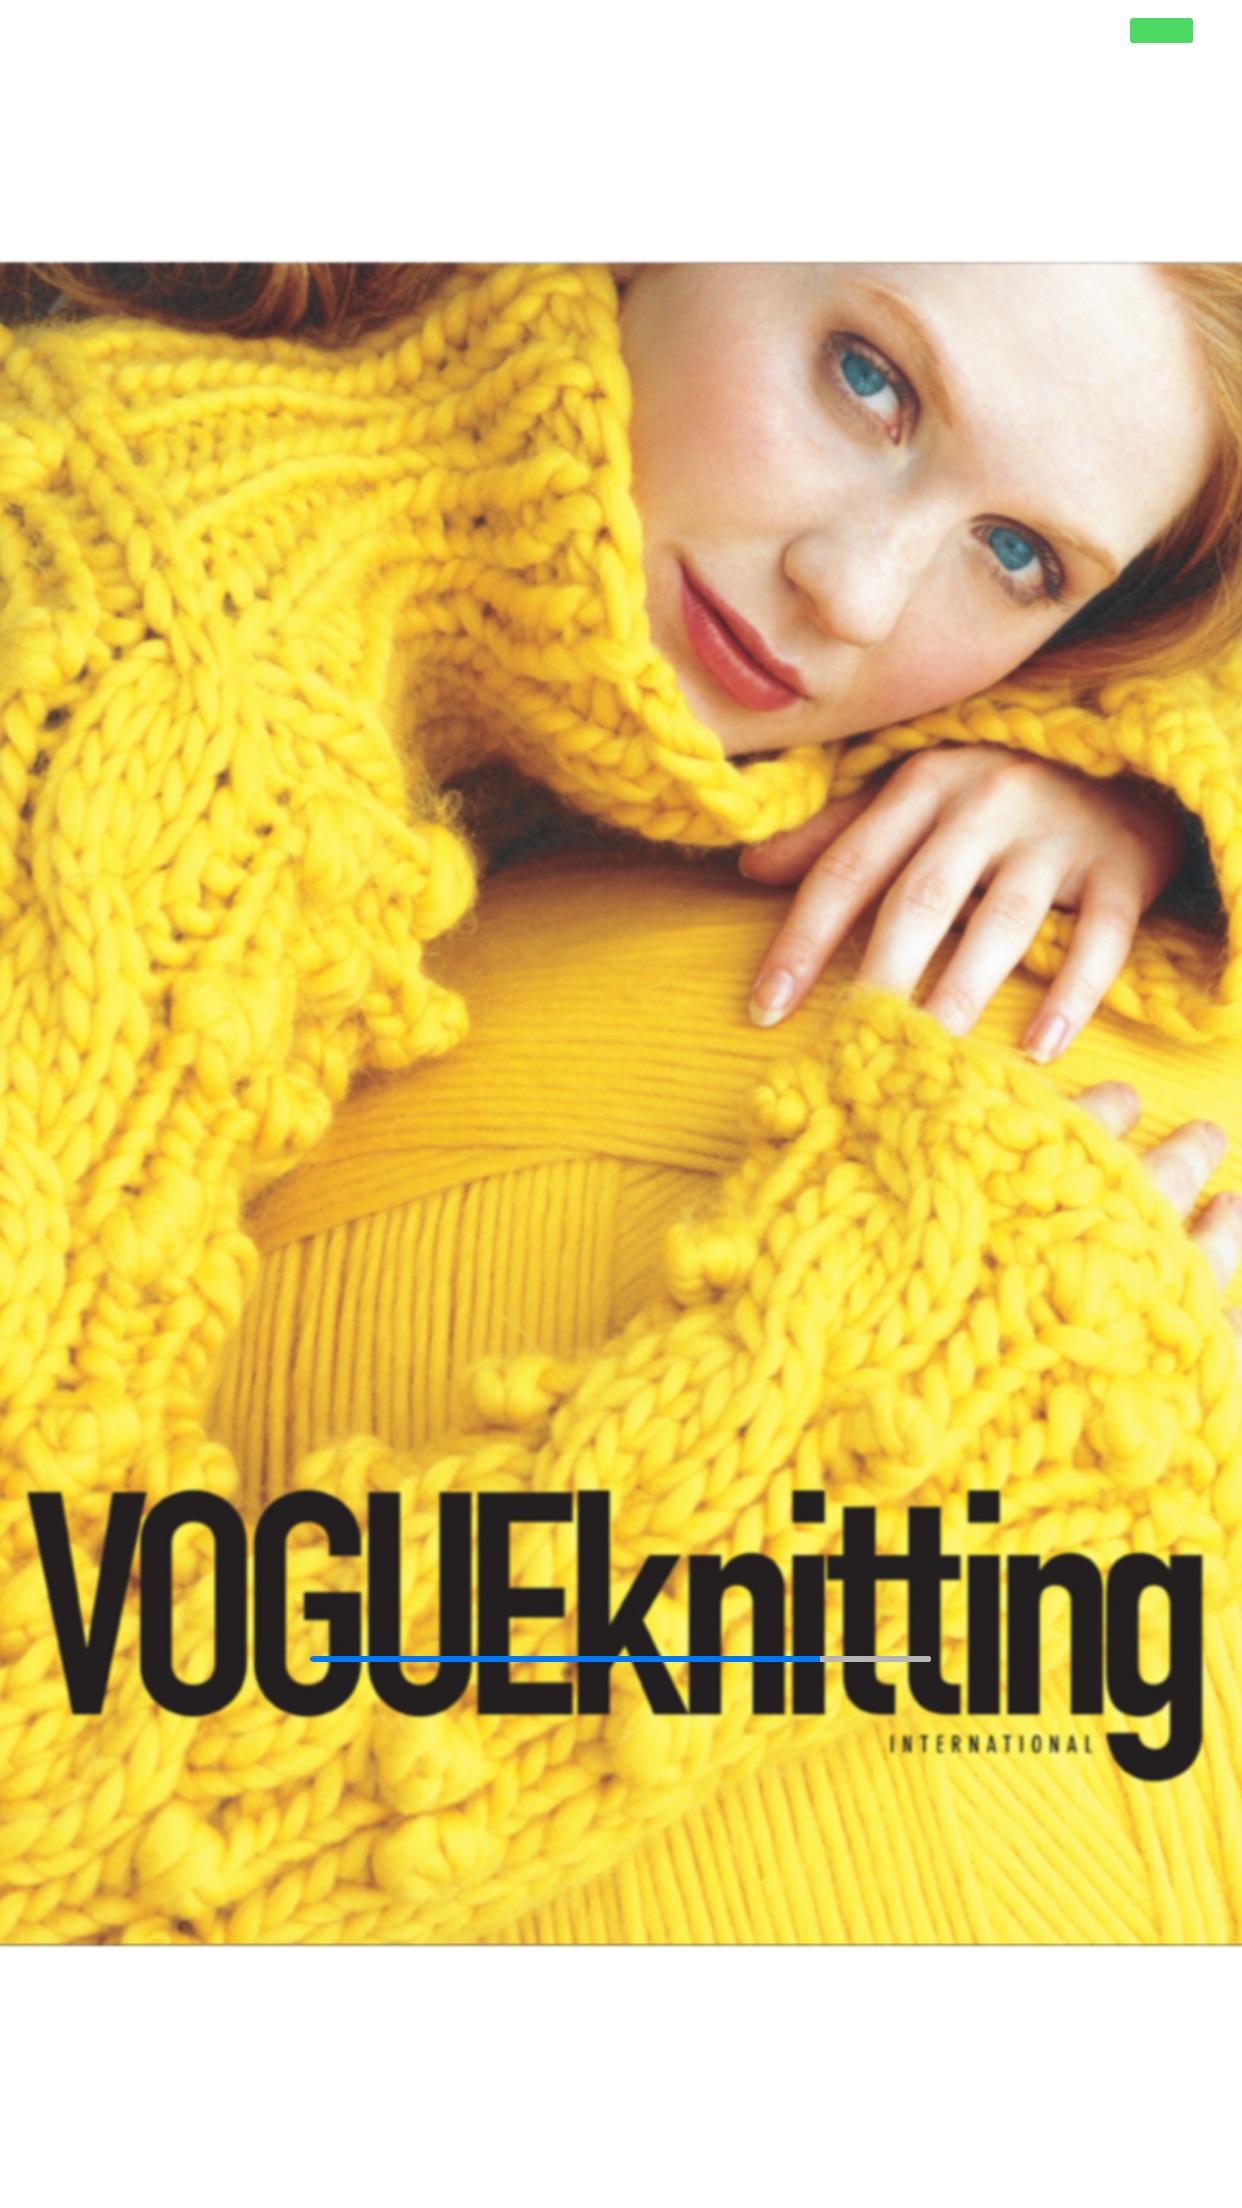 Vogue Knitting Magazine Screenshot